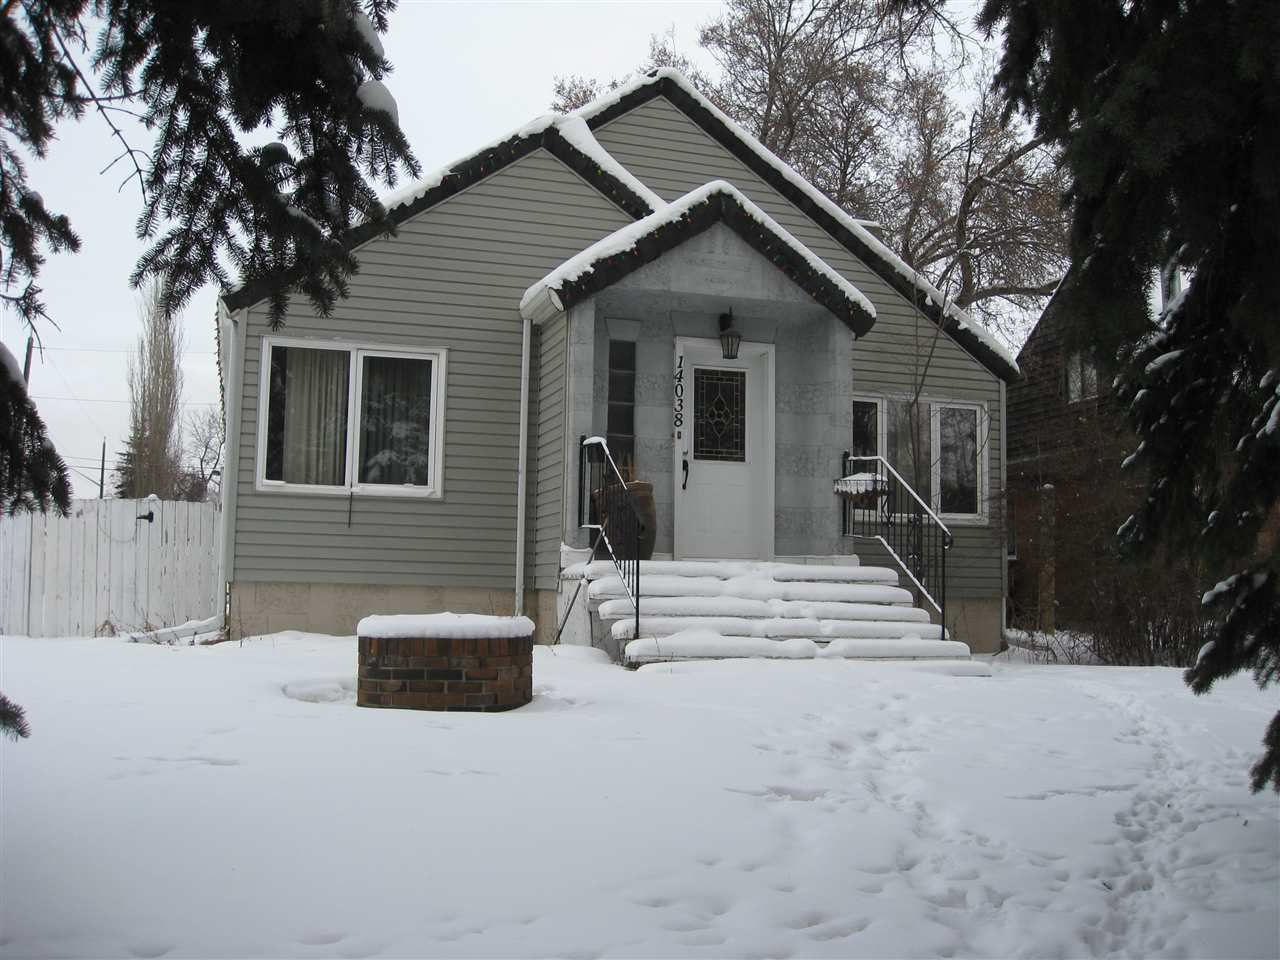 Main Photo: 14038 103 Avenue in Edmonton: Zone 11 House for sale : MLS®# E4144015